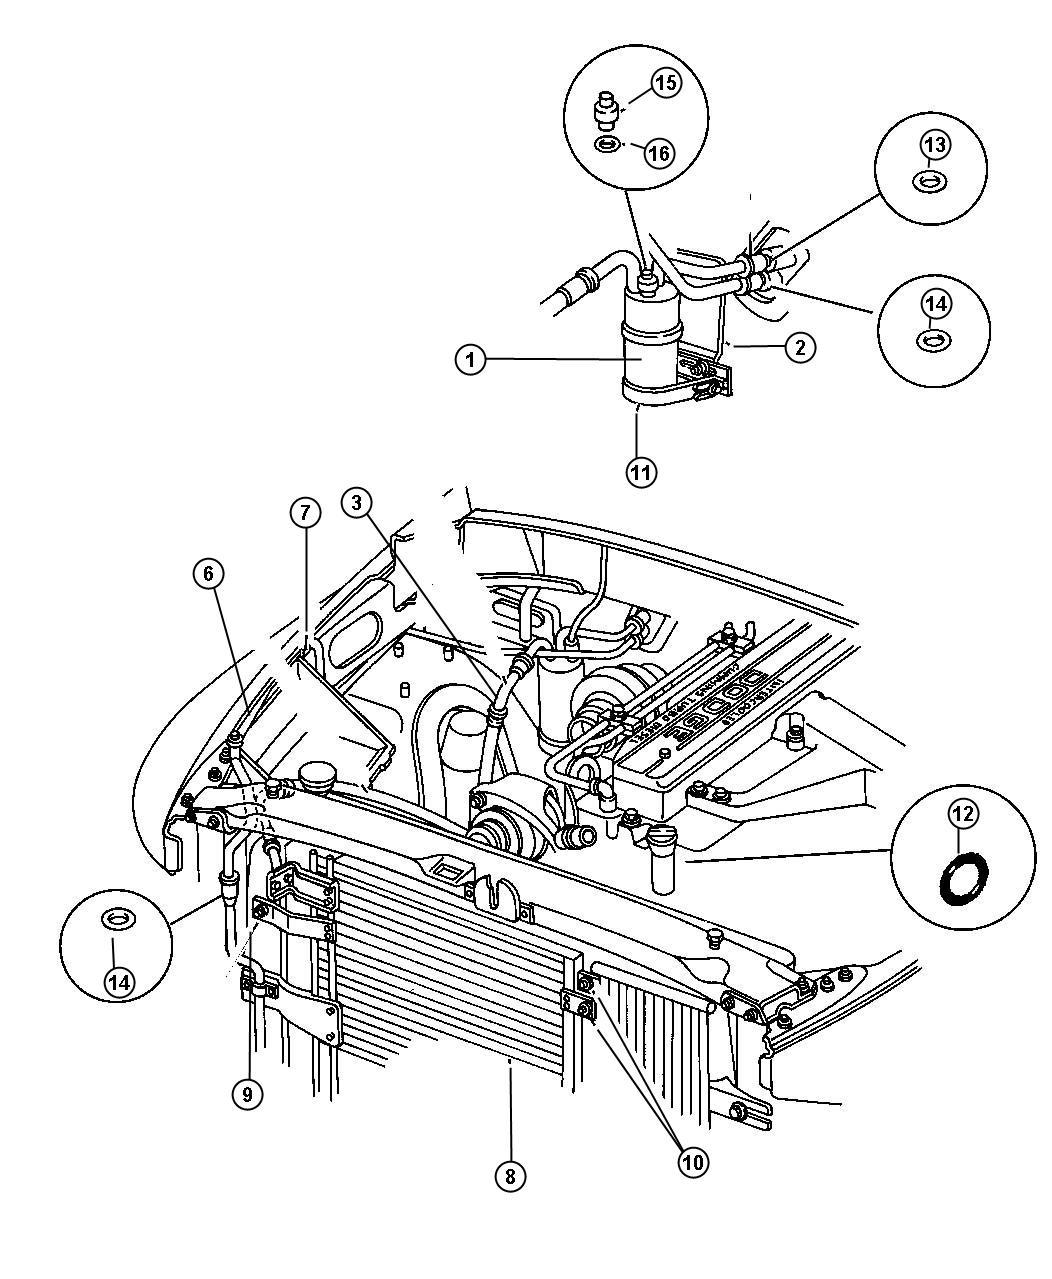 Dodge Ram Condenser Air Conditioning Plumbing